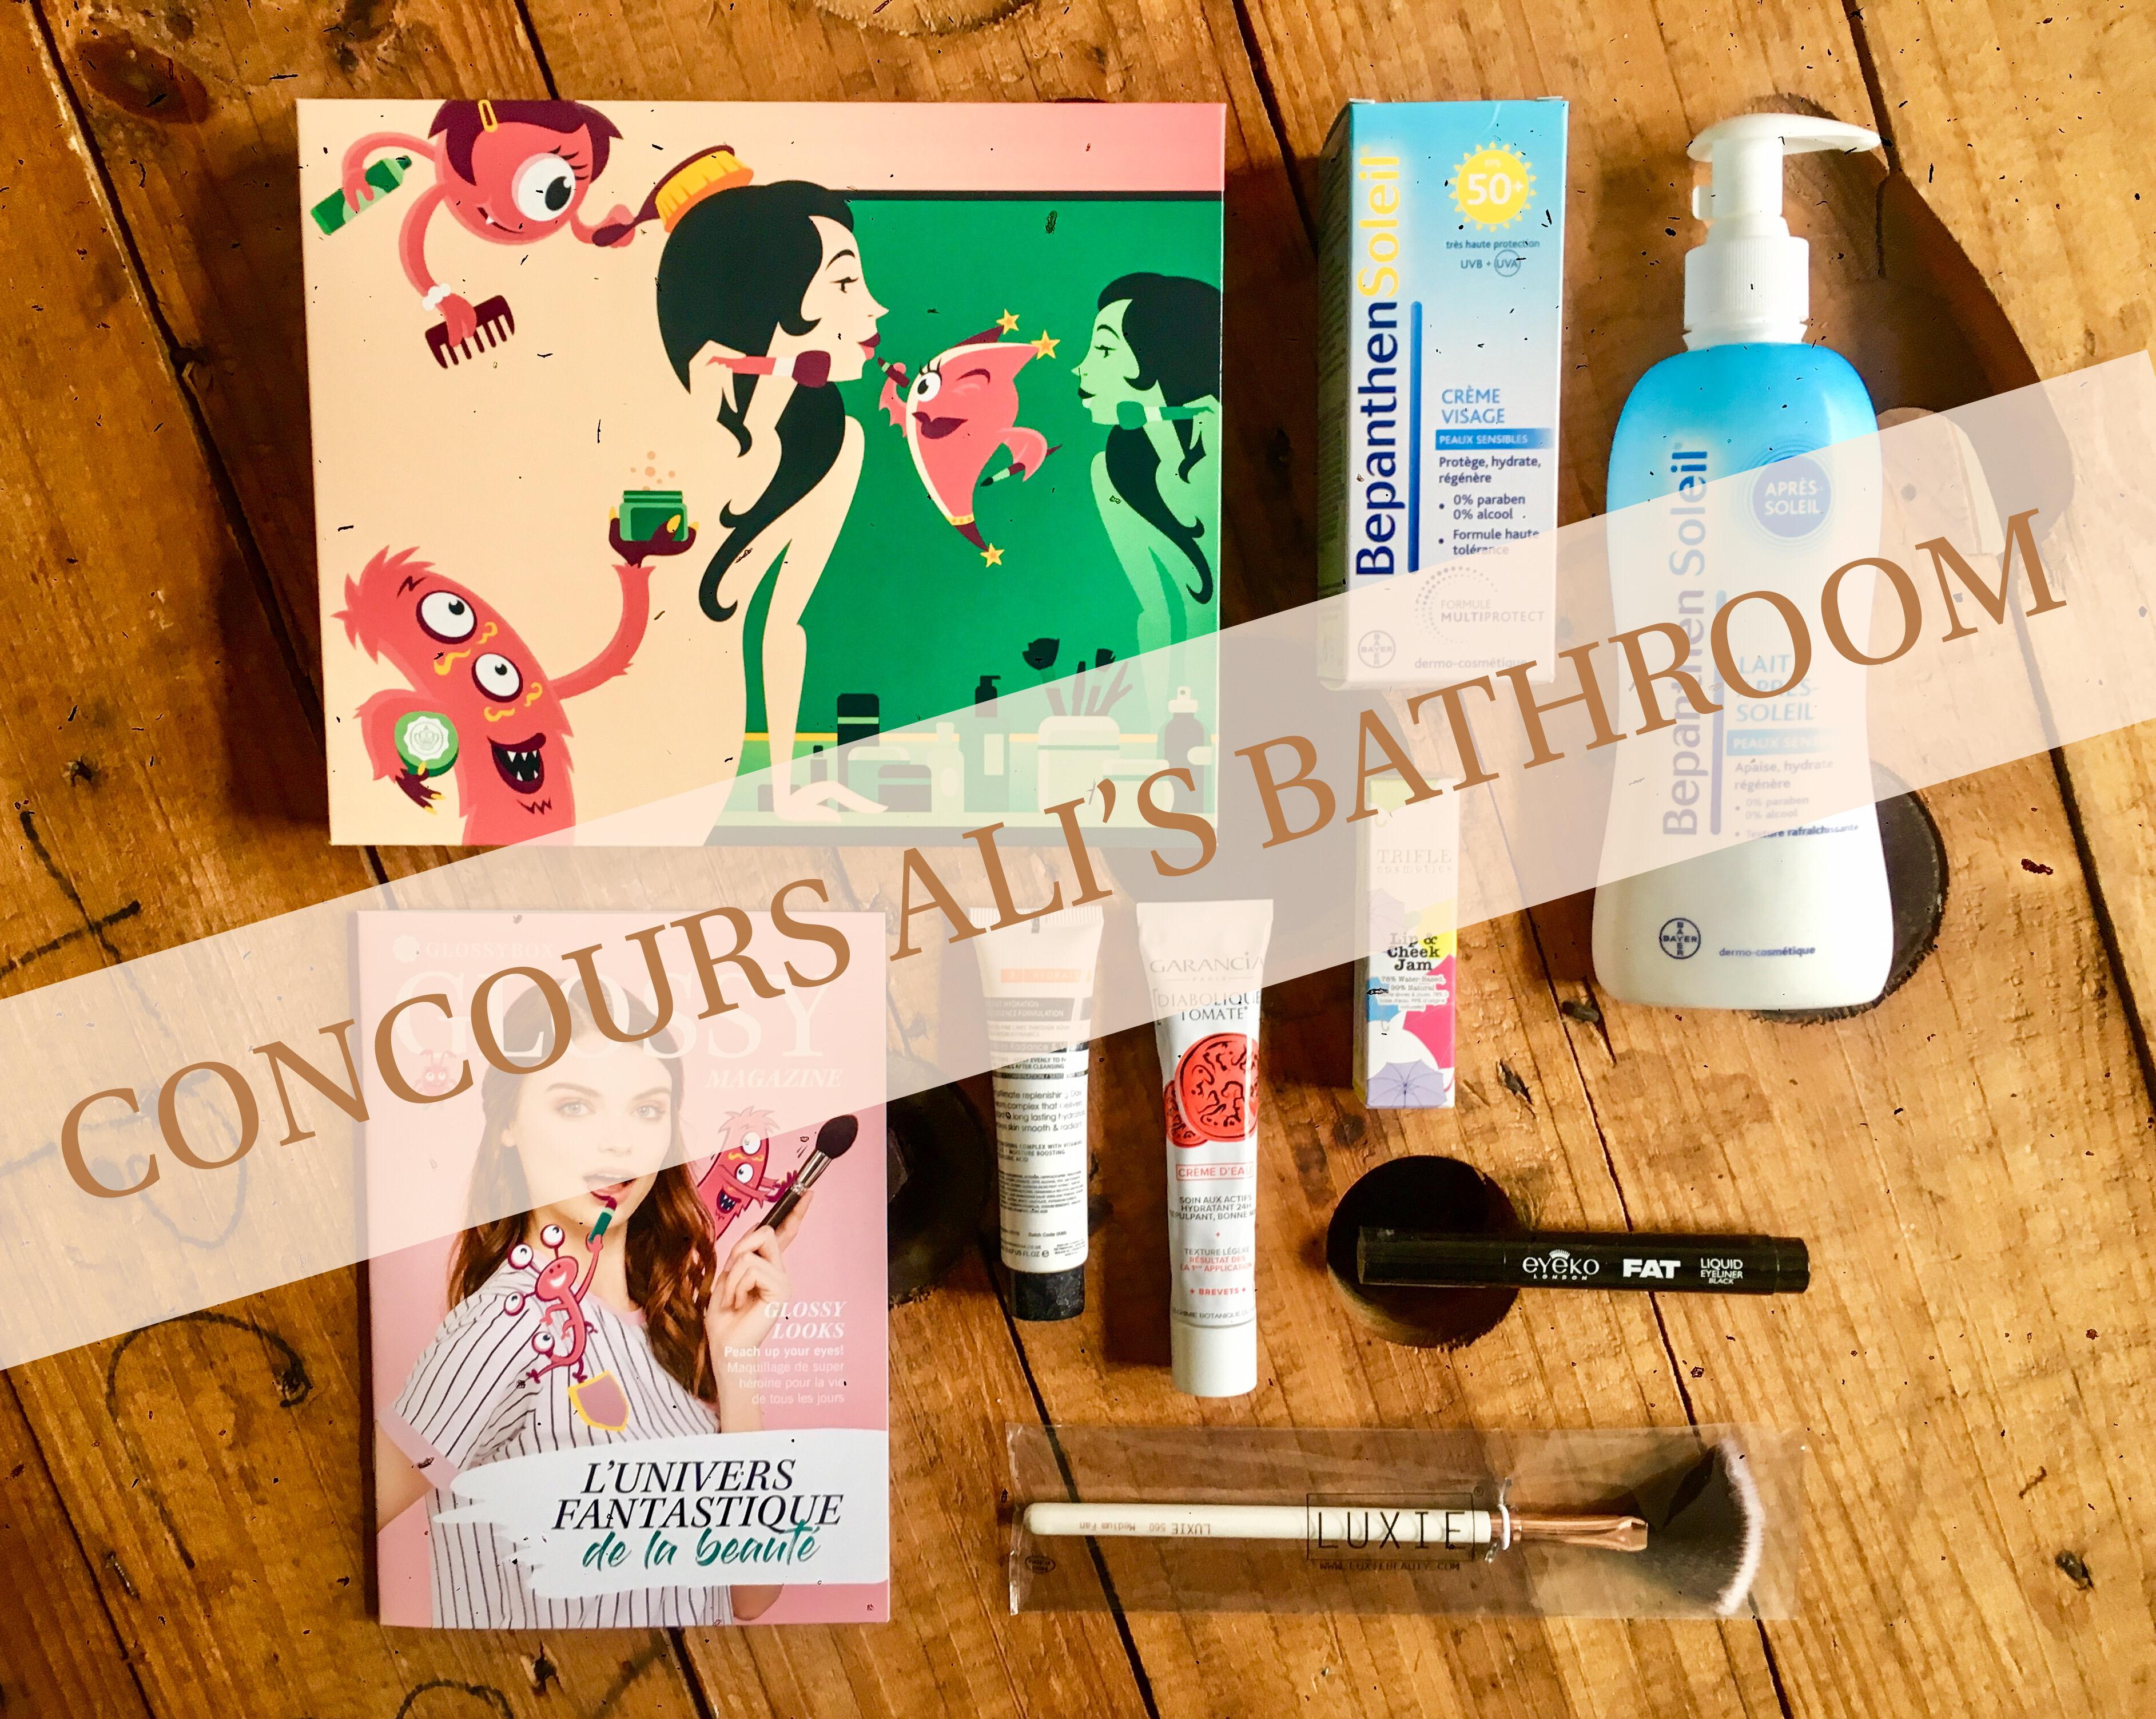 Concours Ali's Bathroom